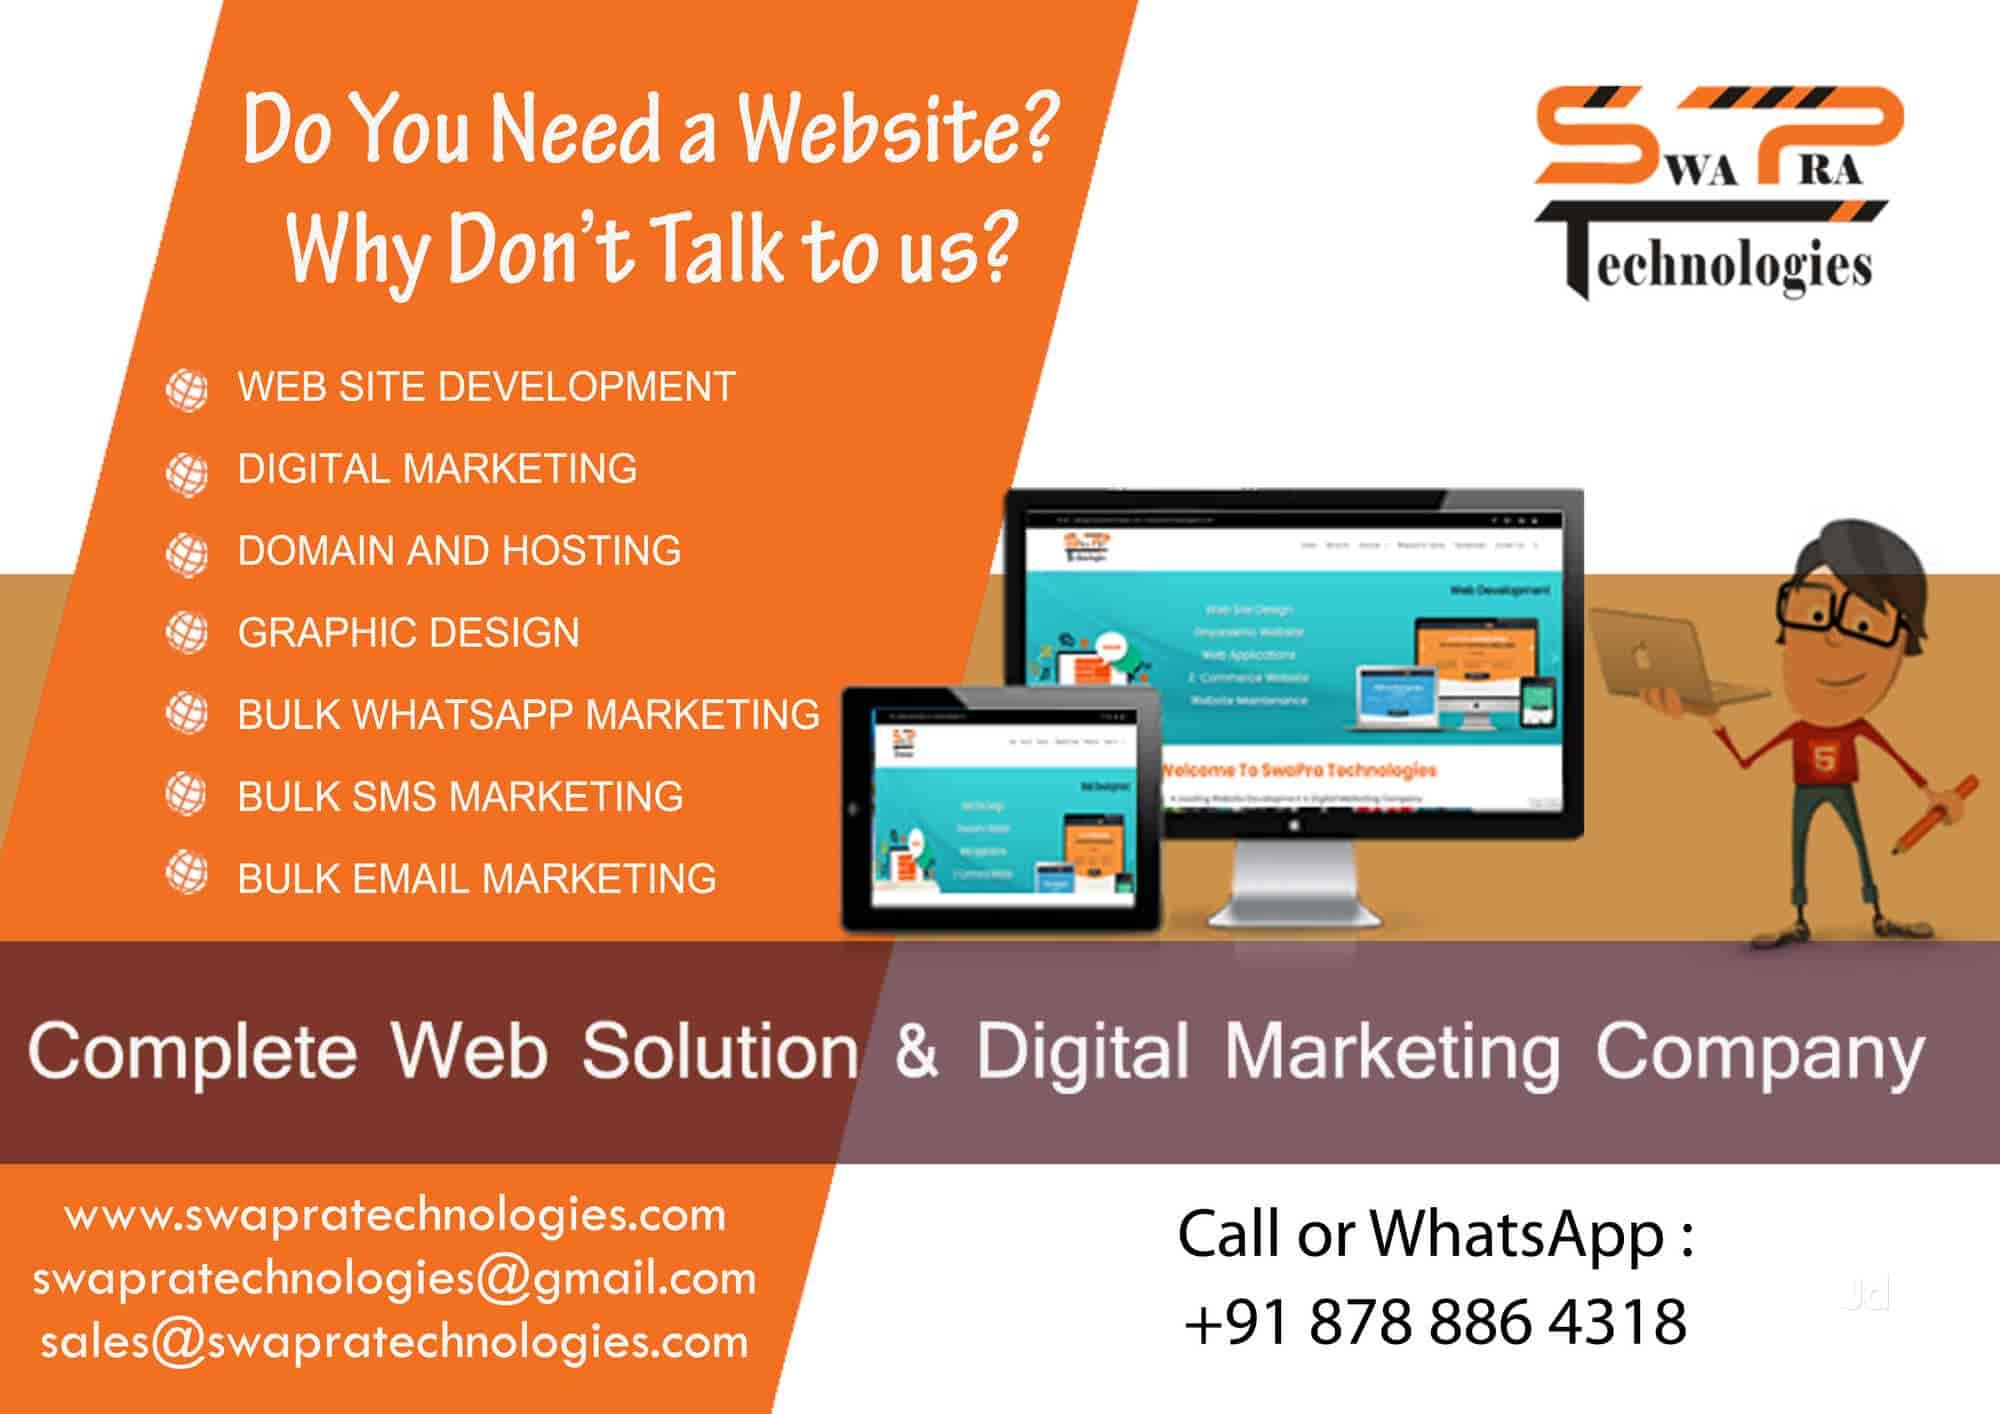 SwaPra Technologies - Swapra Technologies Images, Koregaon Park, Pune - Internet Website Designers